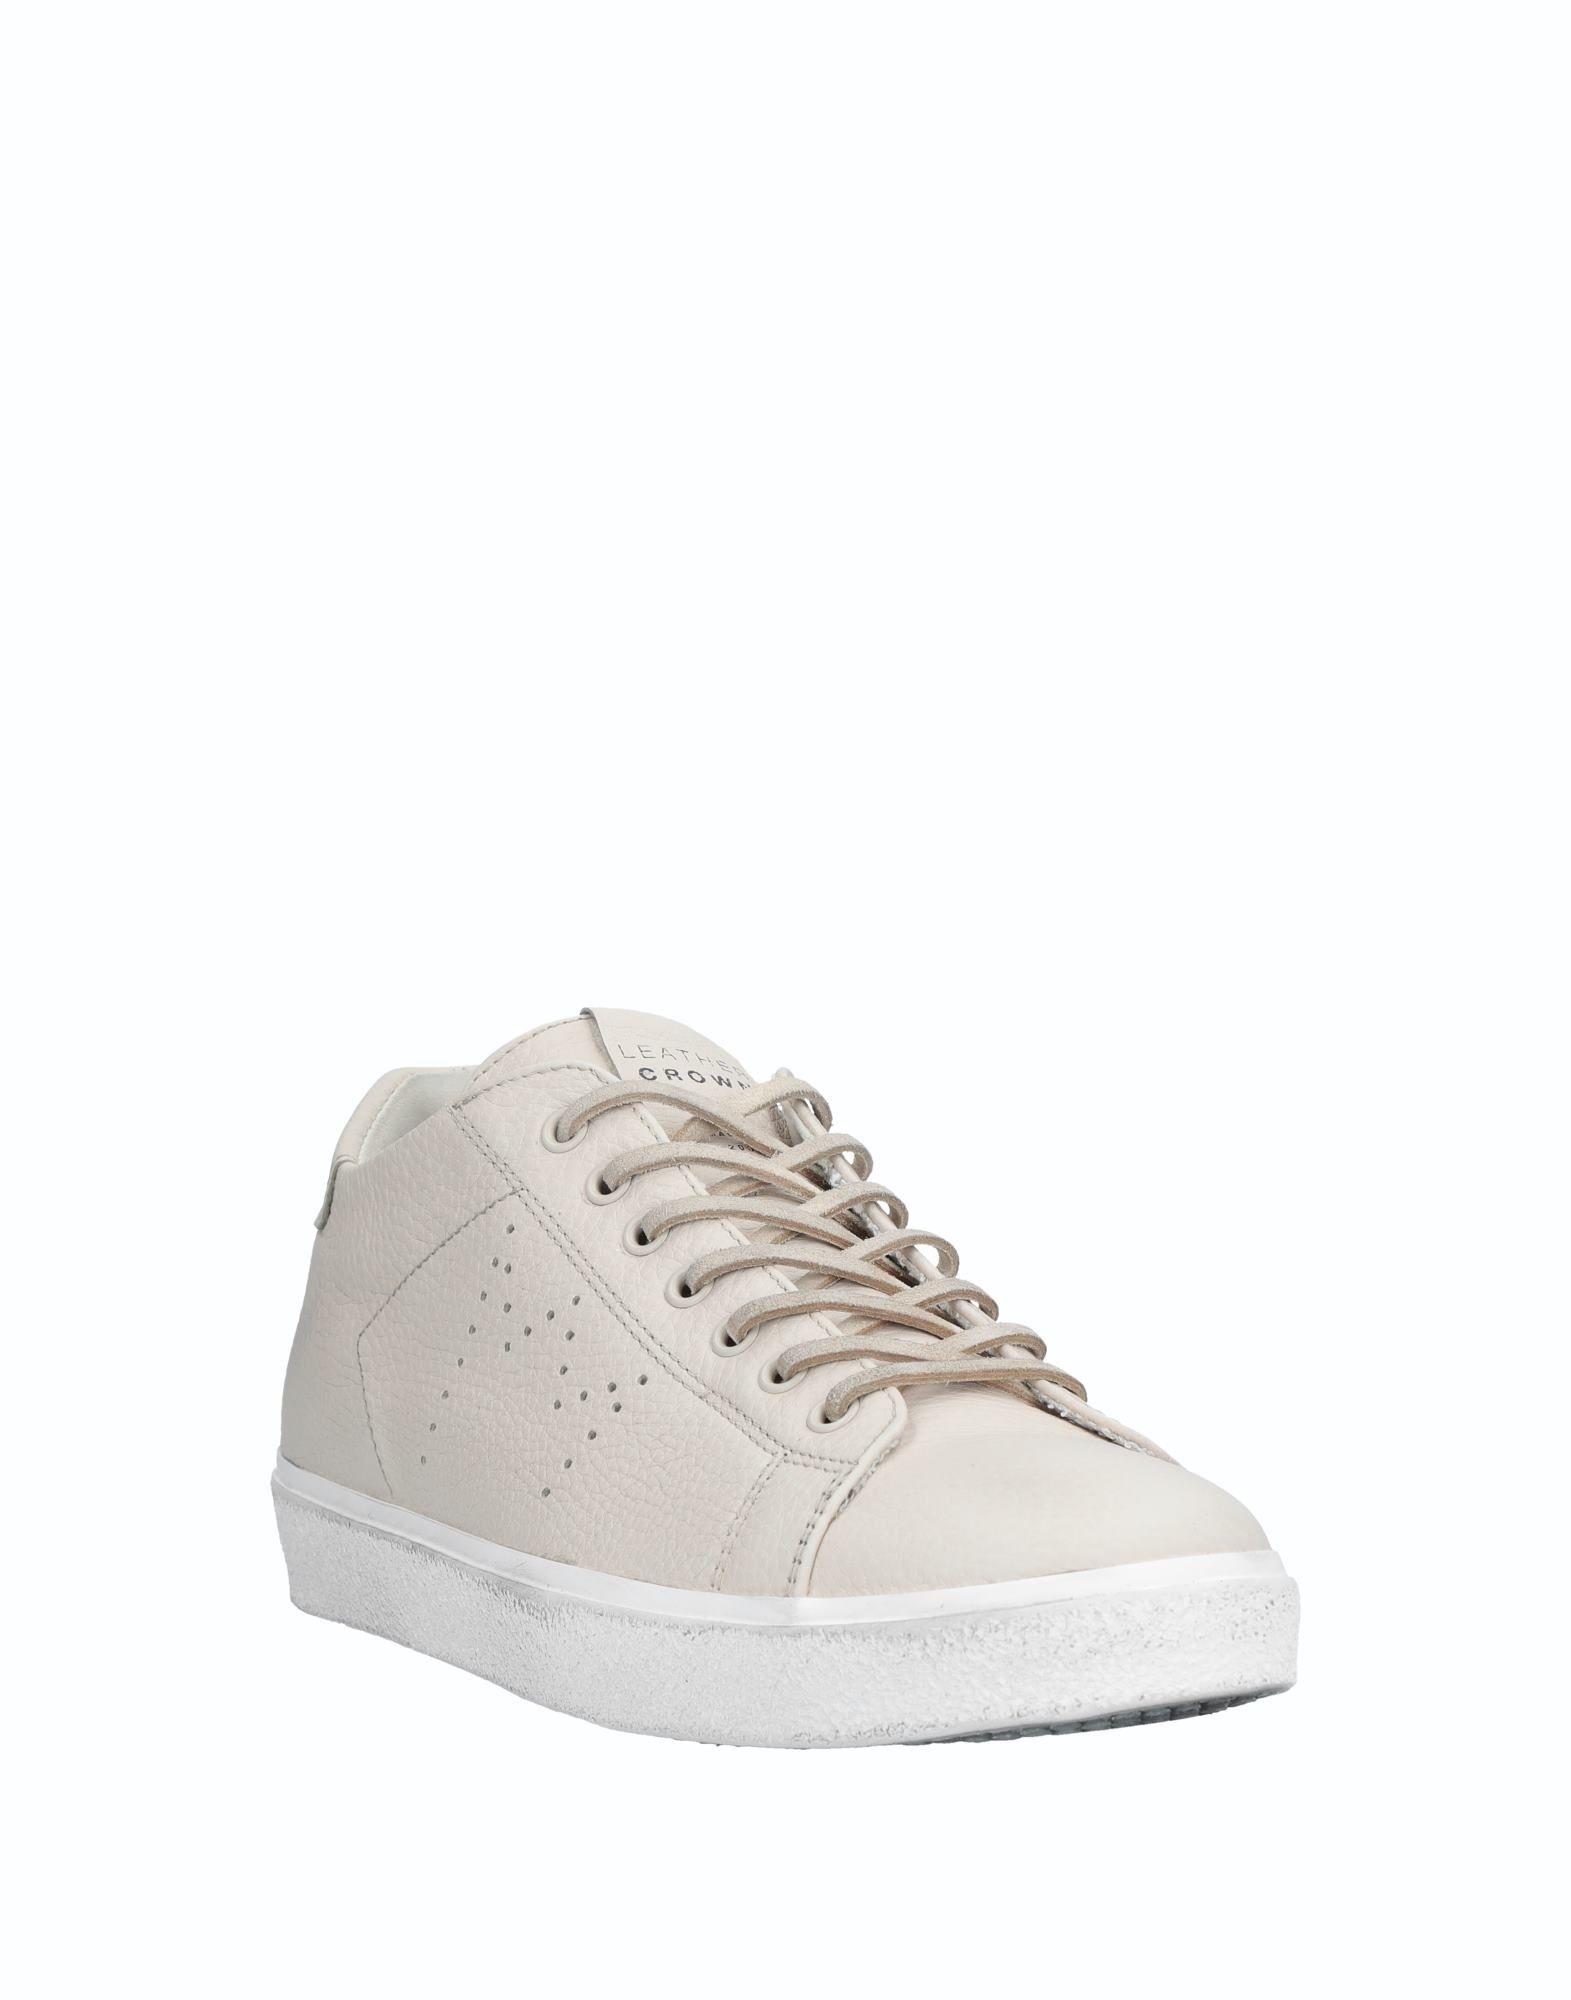 Leather Crown Sneakers Herren  11537253OC Gute Gute Gute Qualität beliebte Schuhe 81f77a